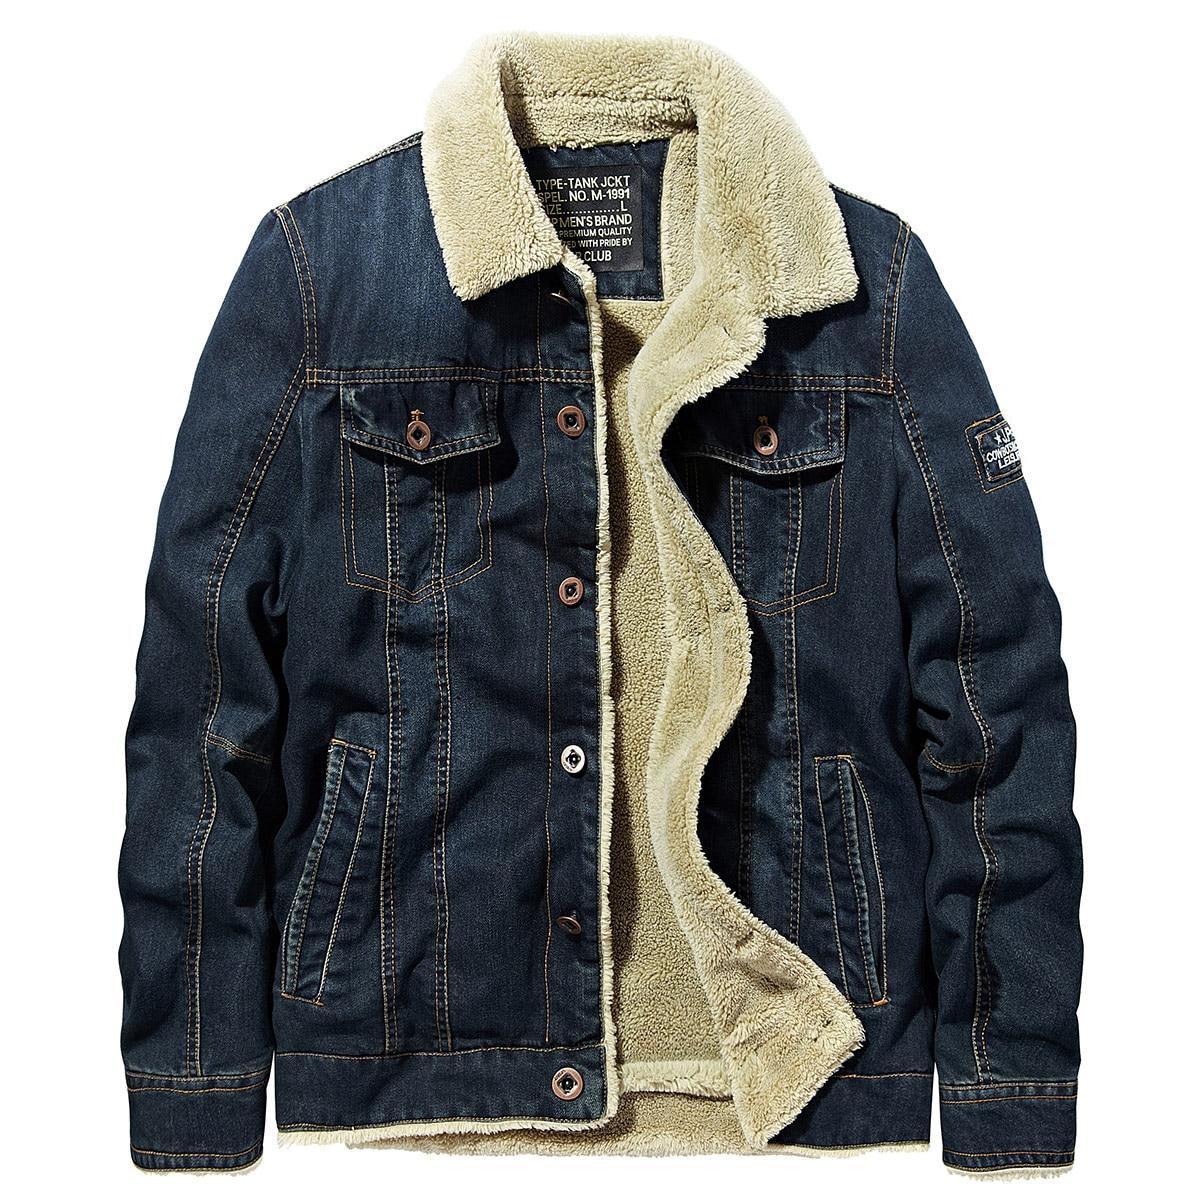 Winter Thick Men Jacket Jeans Casual Padded Streetwear Vintage Denim Coat Korean Military Japanese Men Jacket Tactical AA50JK